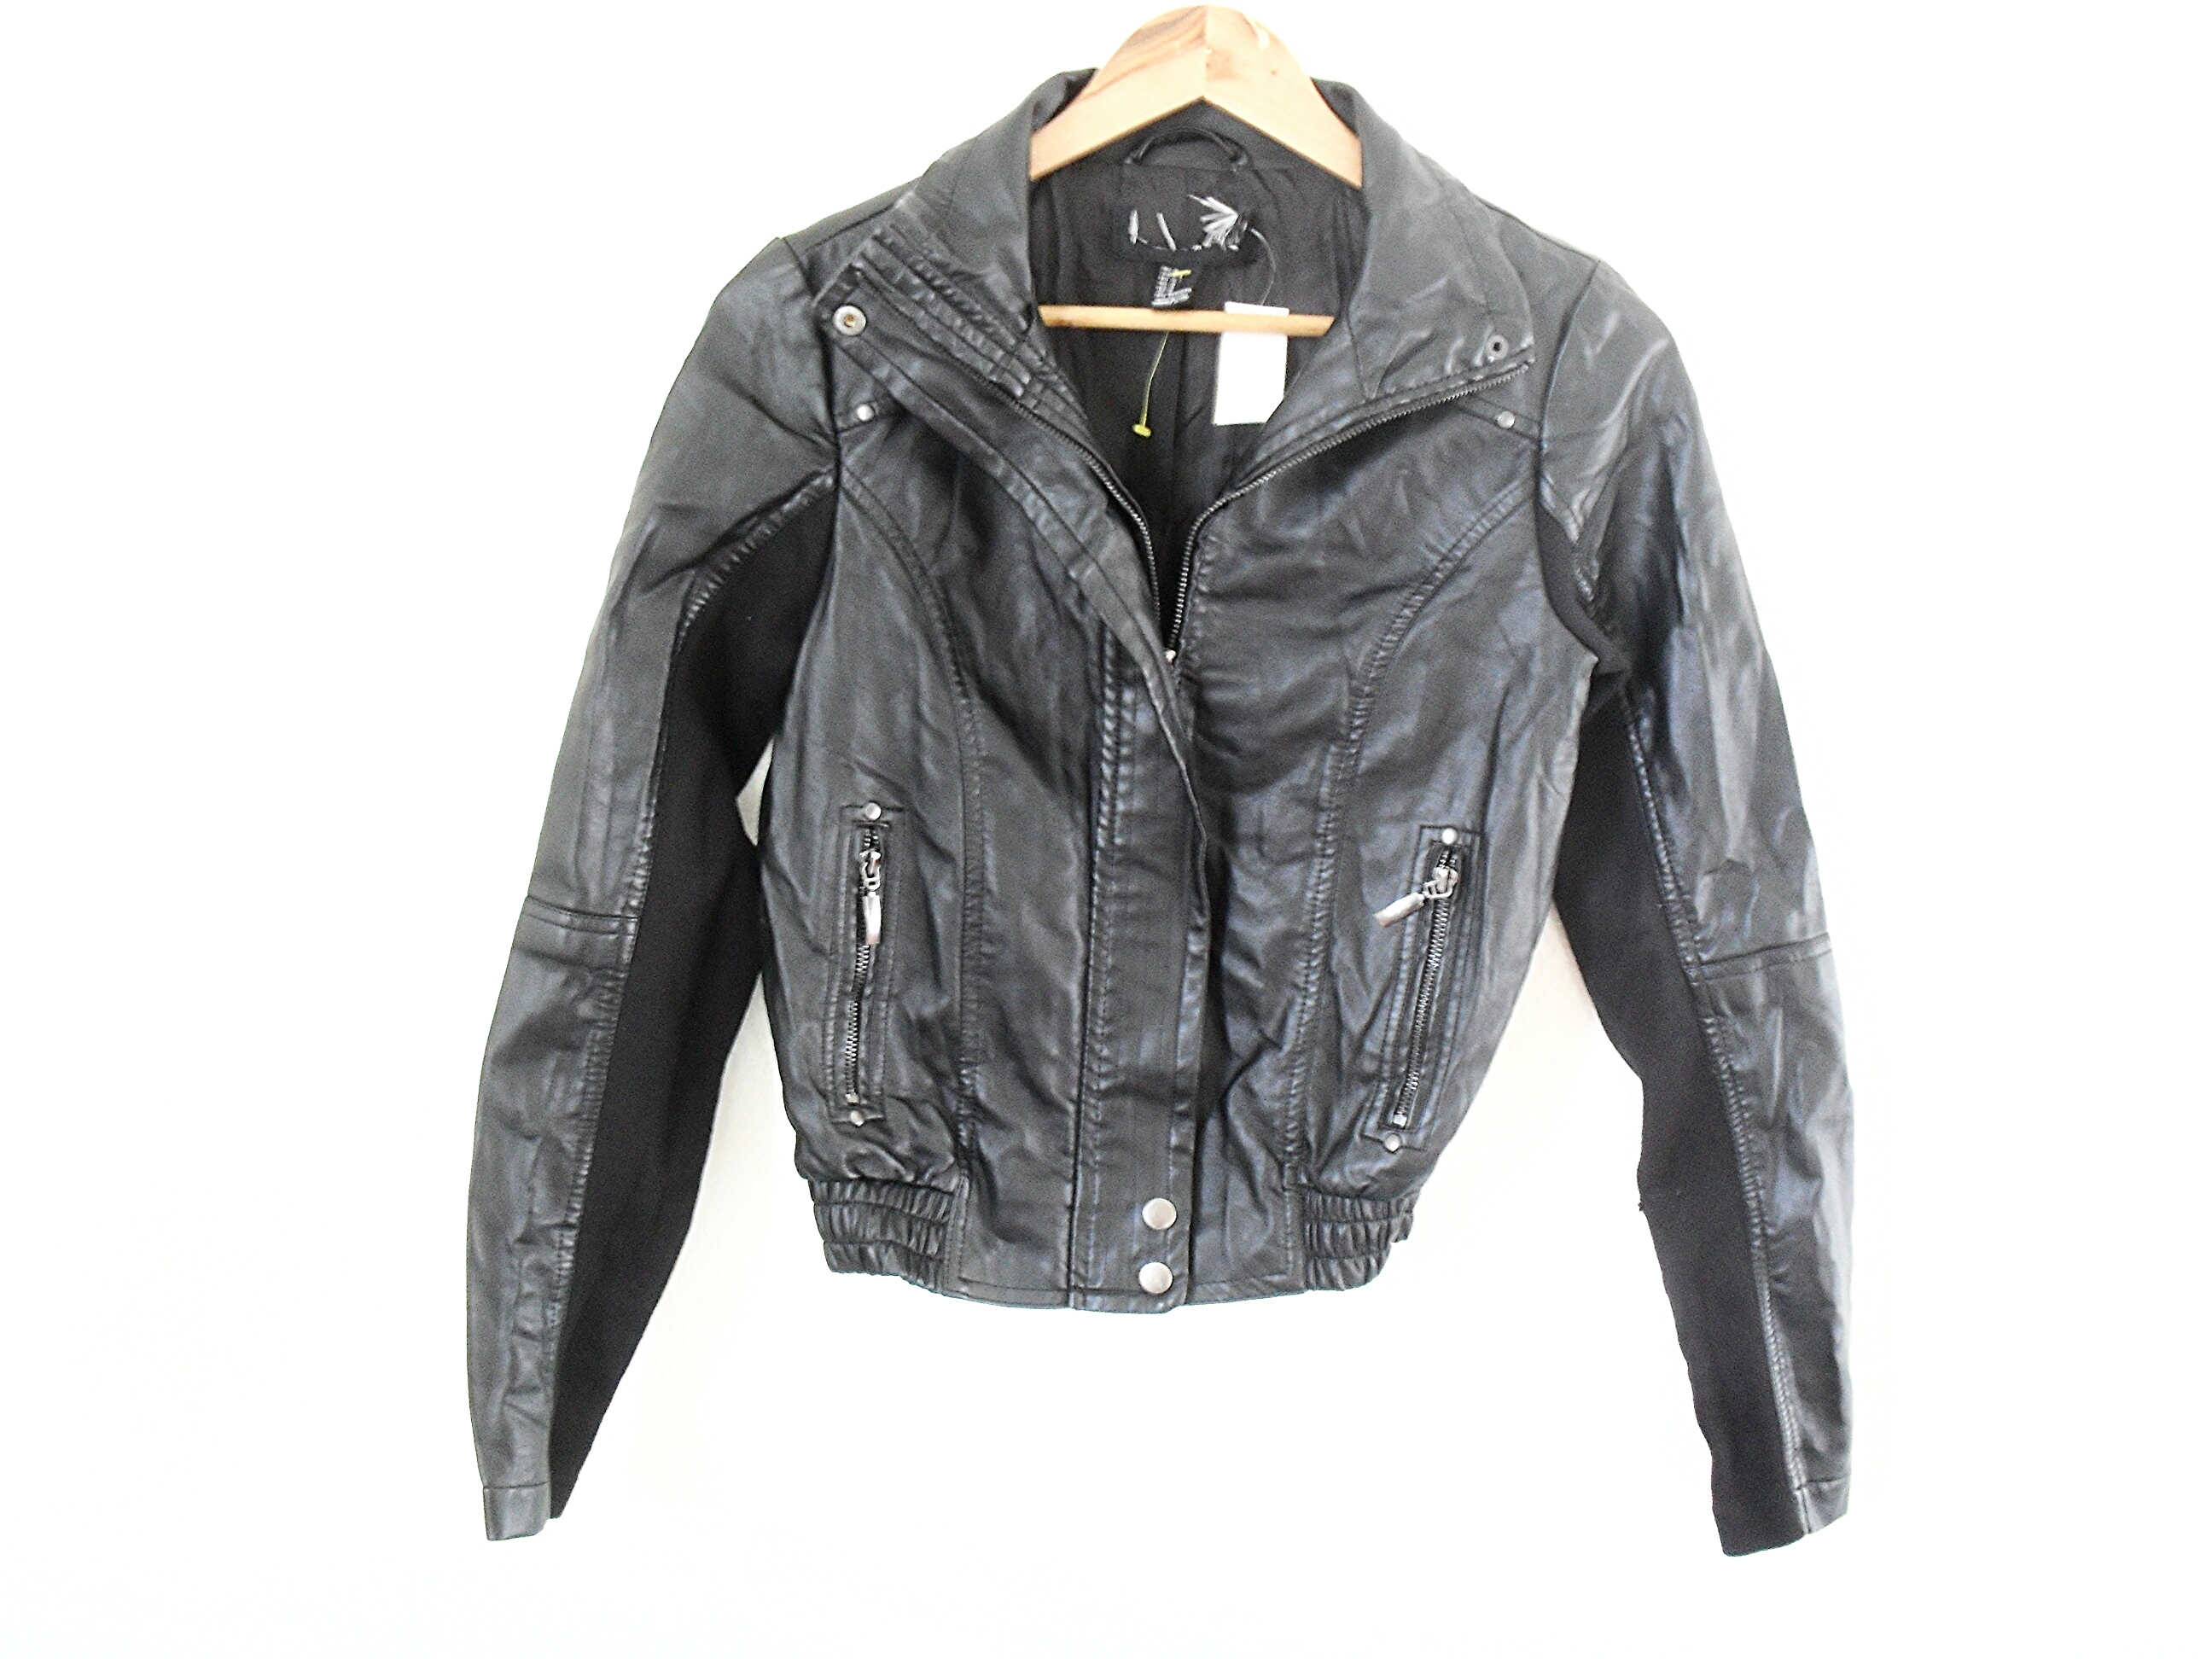 e753c0420 BNWT Forever 21 Black Leather Jacket from KLEXA